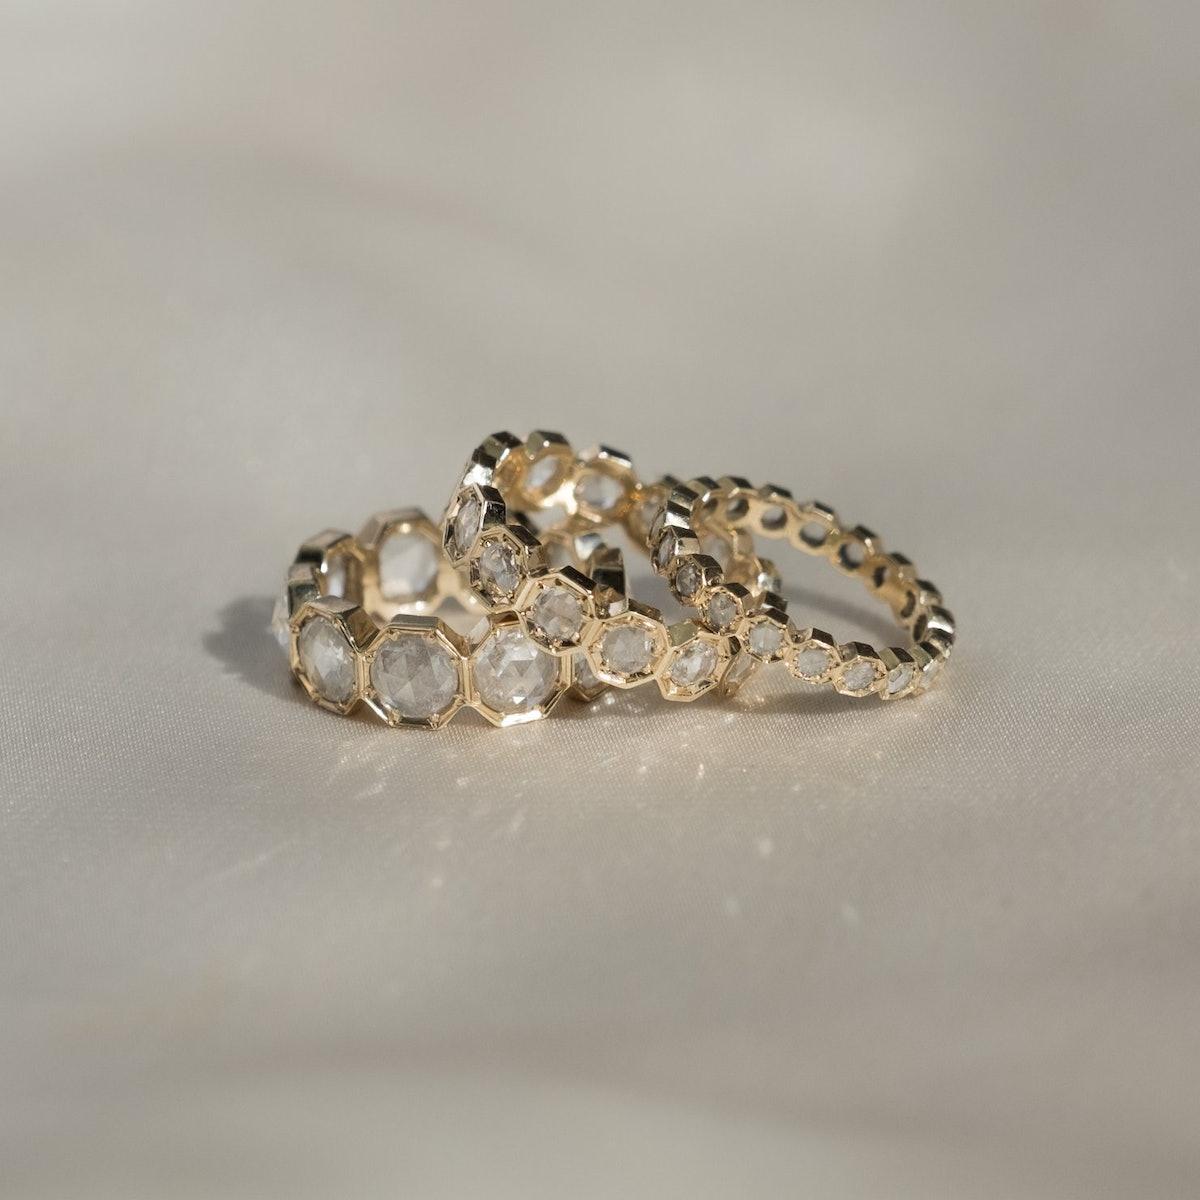 3MM Crown Bezel Diamond Eternity Ring